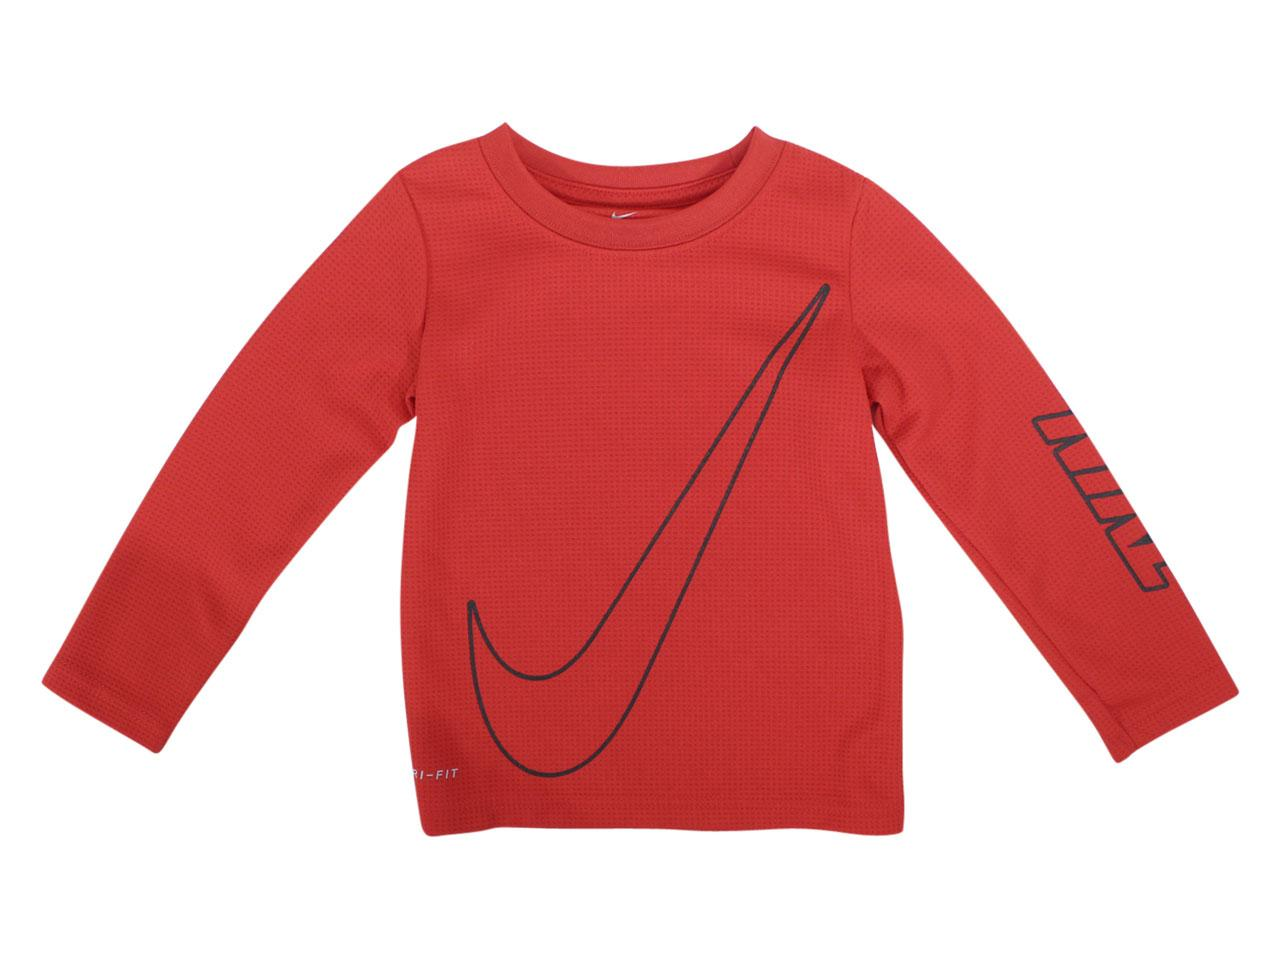 Nike Toddler Boy's Dri-FIT Long Sleeve Crew Neck Thermal T-Shirt